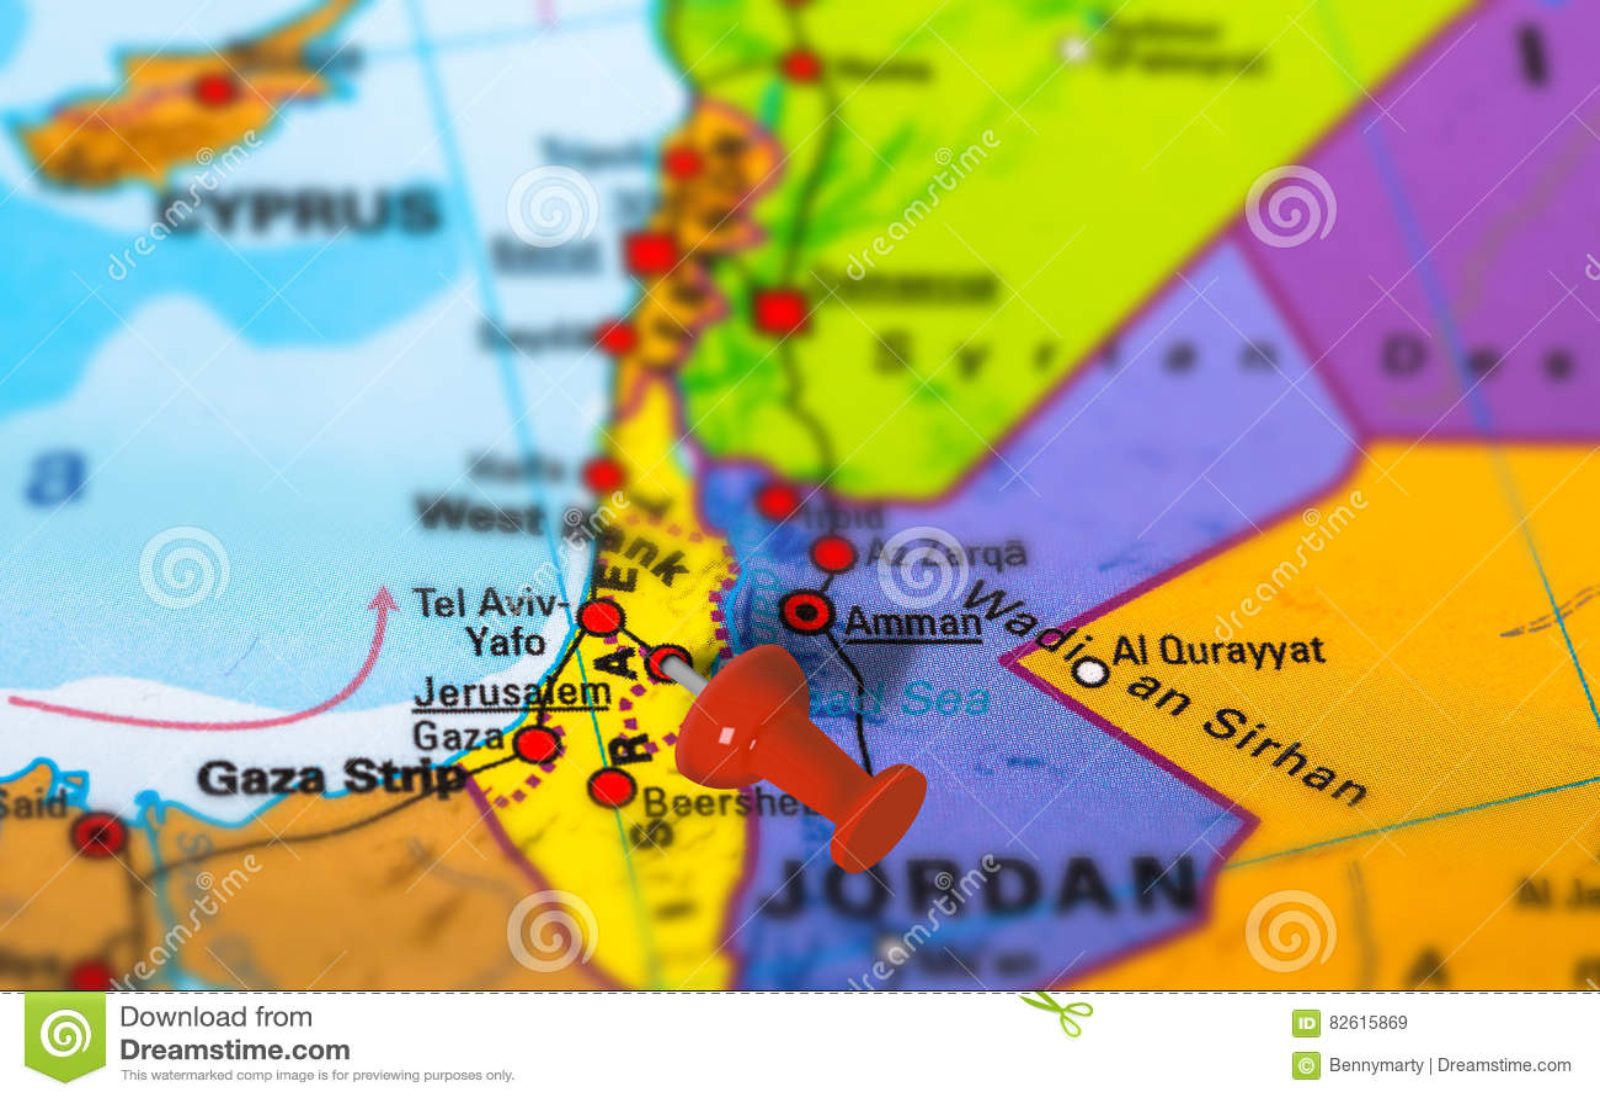 Jerusalem Israel map stock image. Image of geography - 82615869